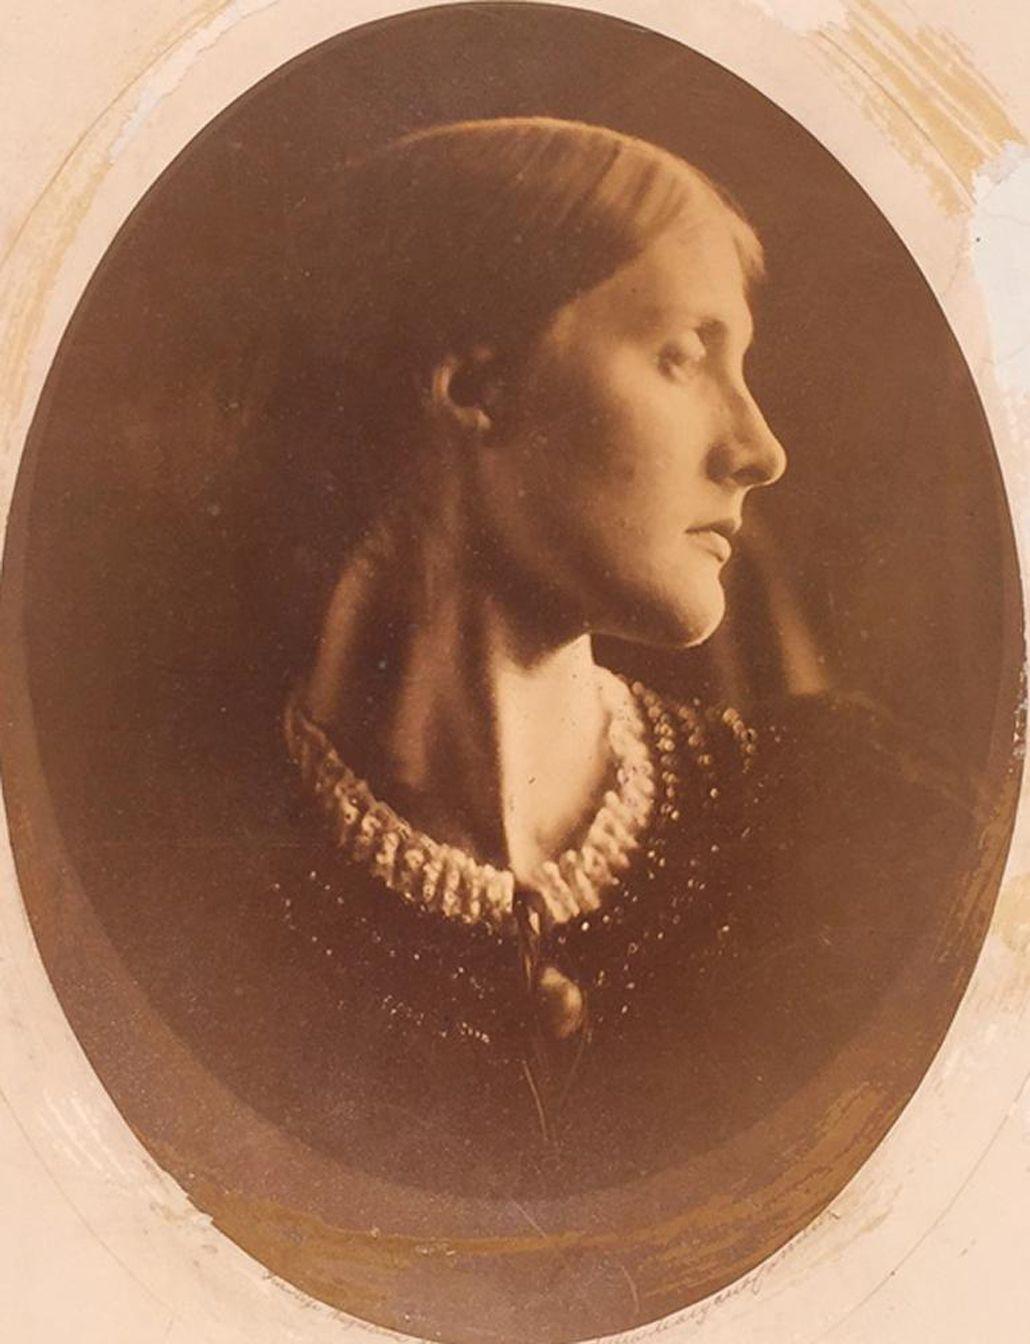 Portrait of woman by Julia Margaret Cameron